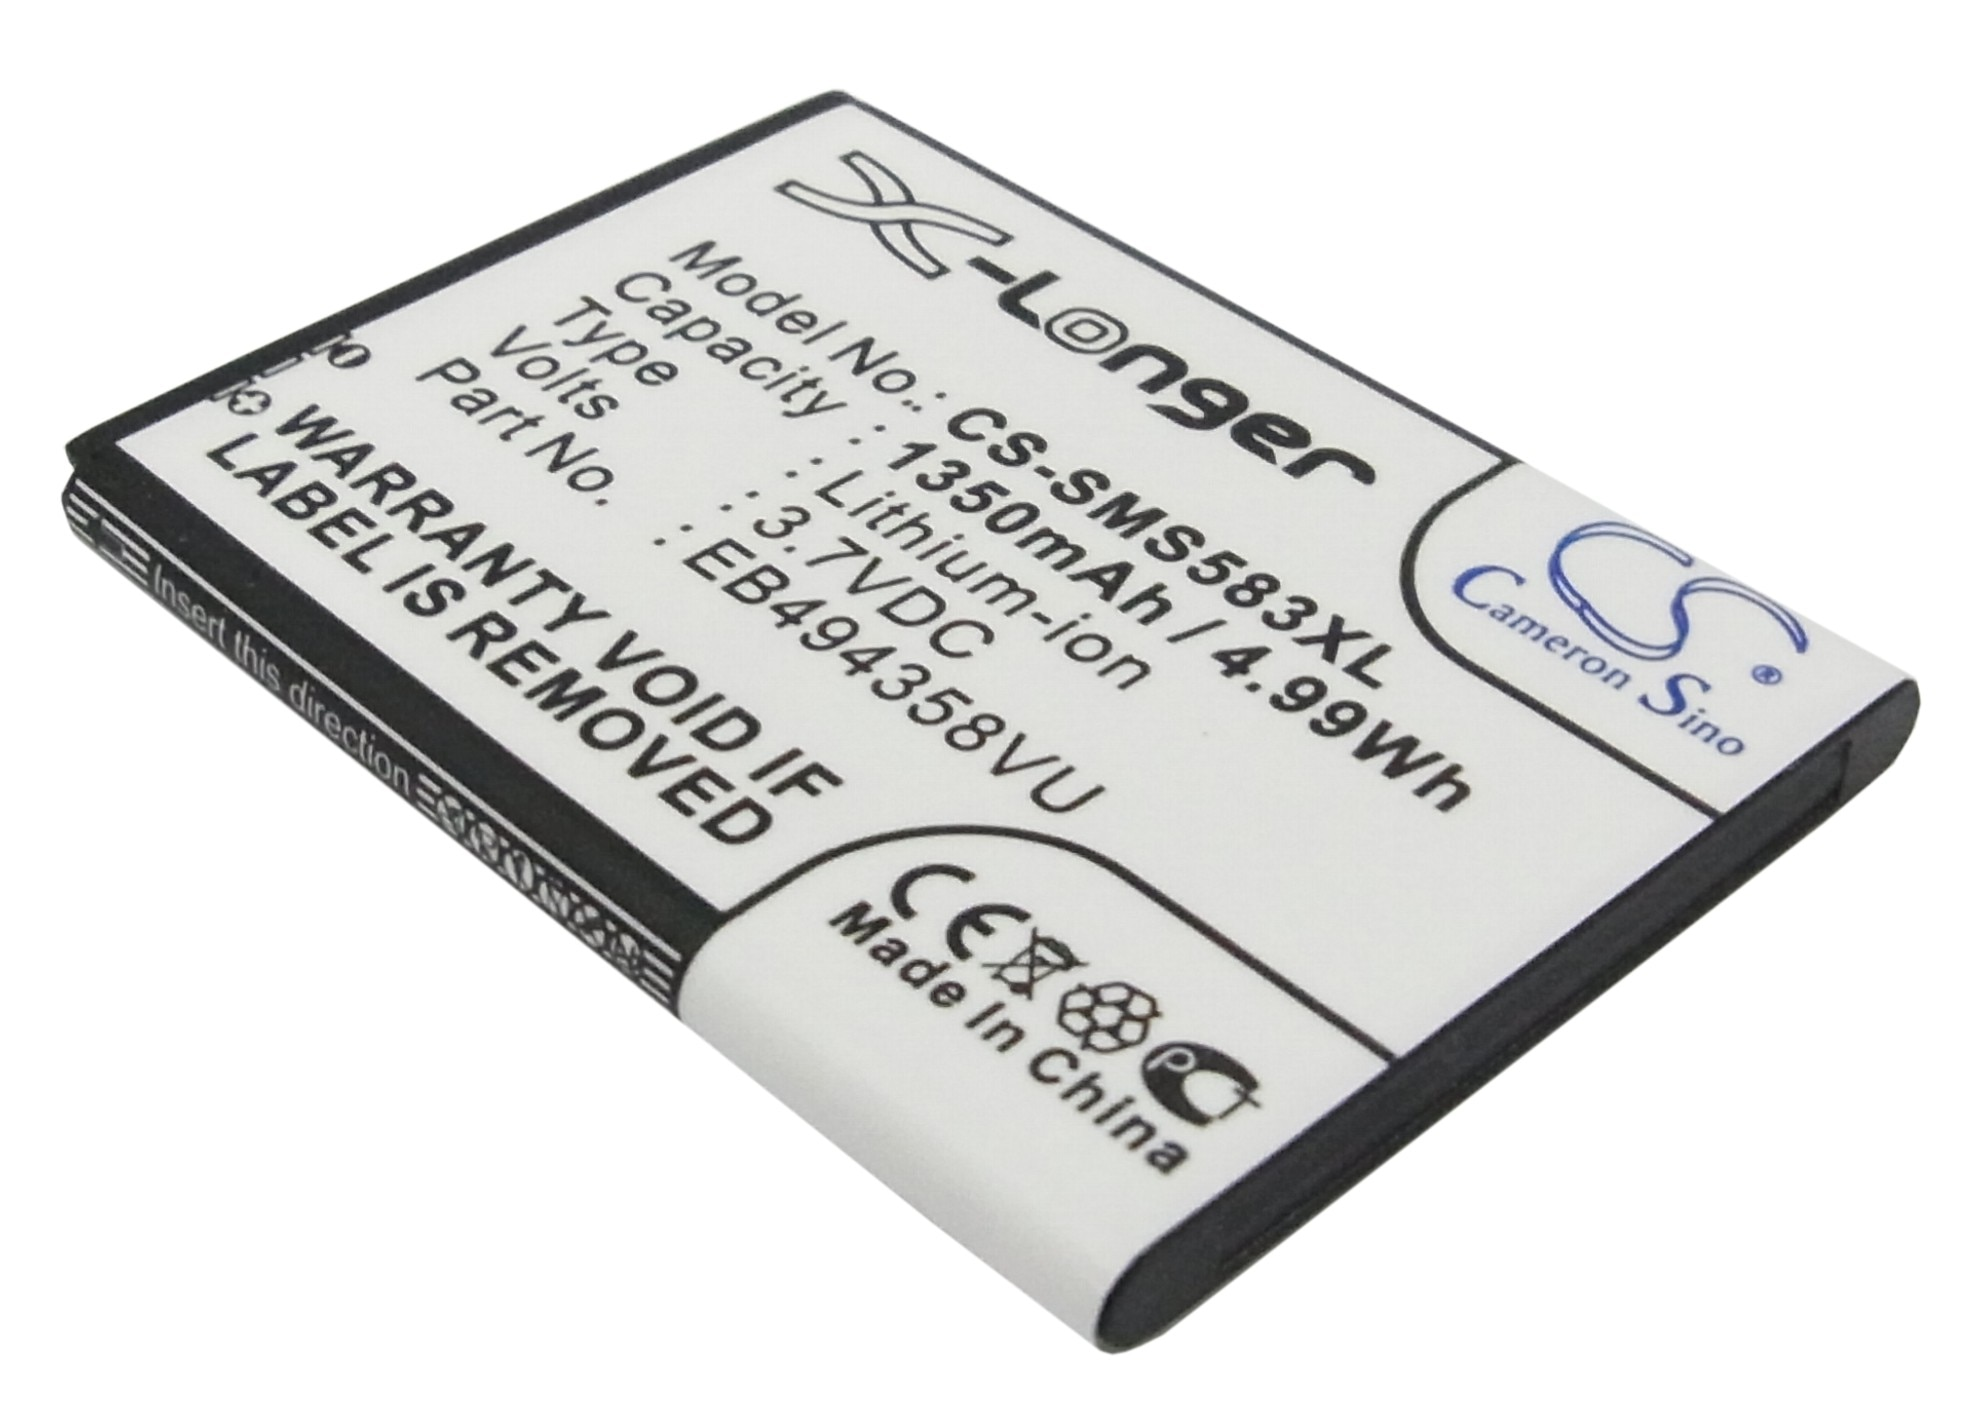 Cameron sino eb494358vu bateria para ace, cooper, galaxy ace, galaxy fit, galaxy gio, g